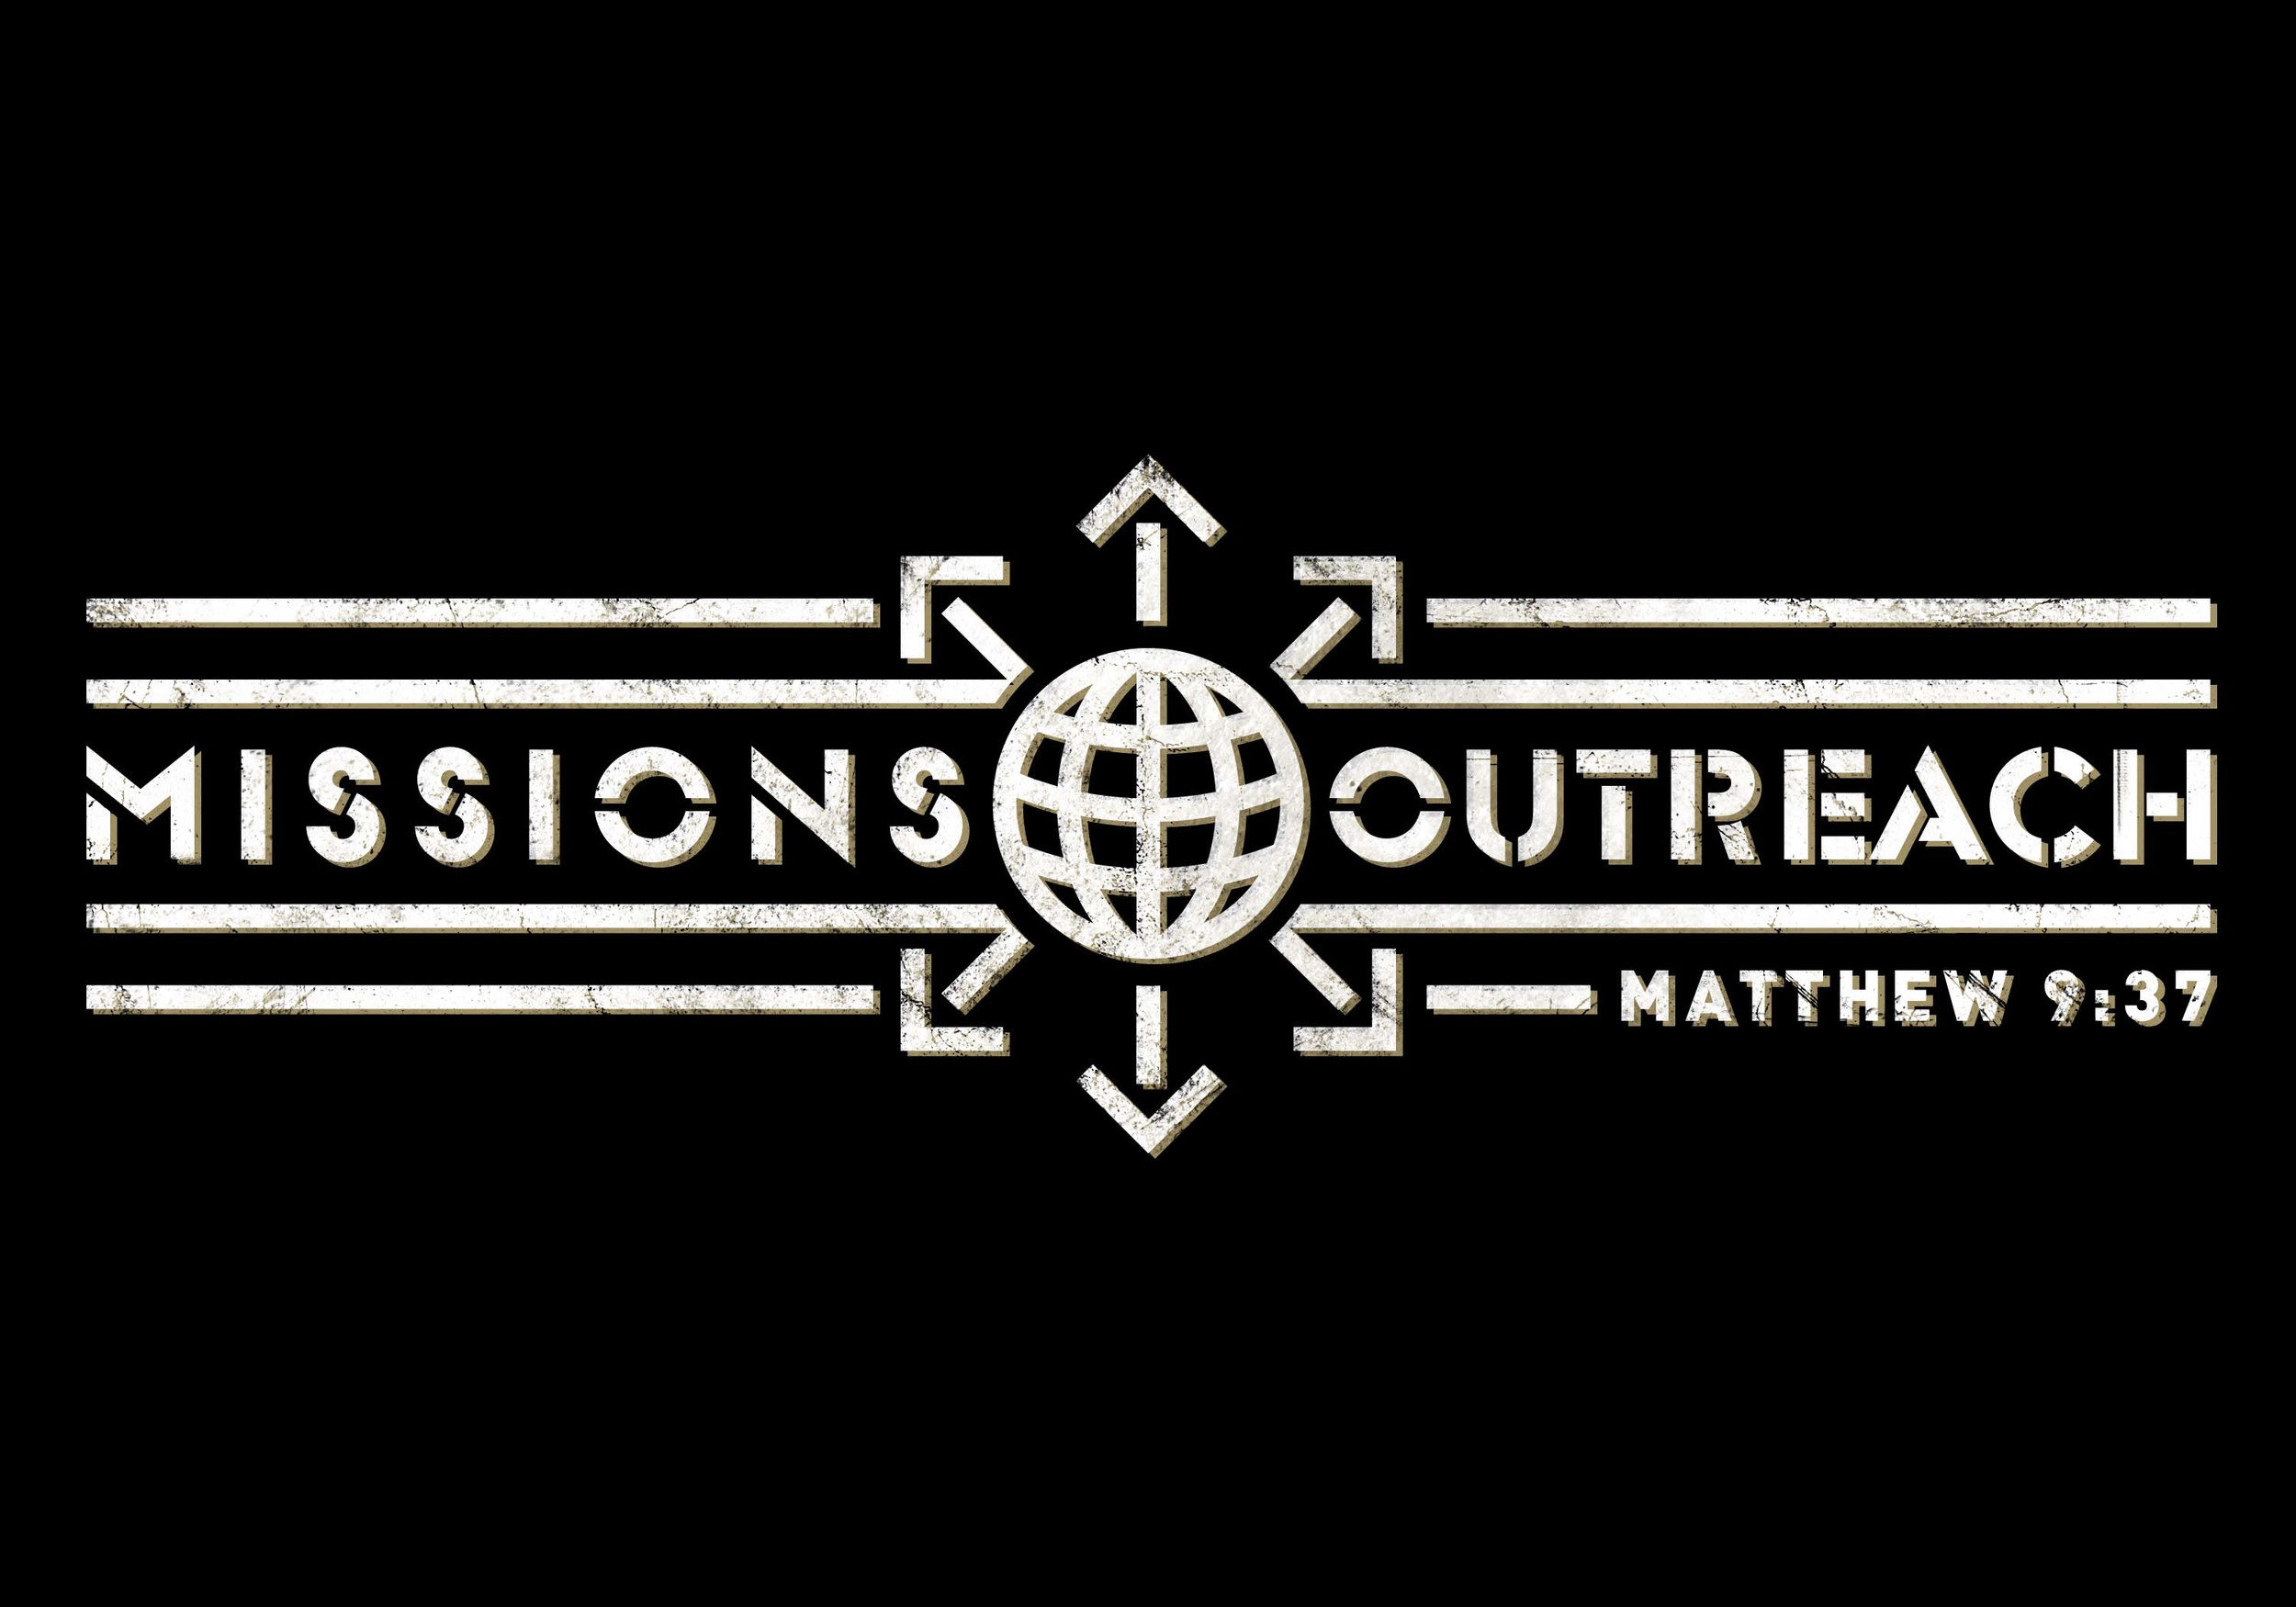 missionoutreach.jpg